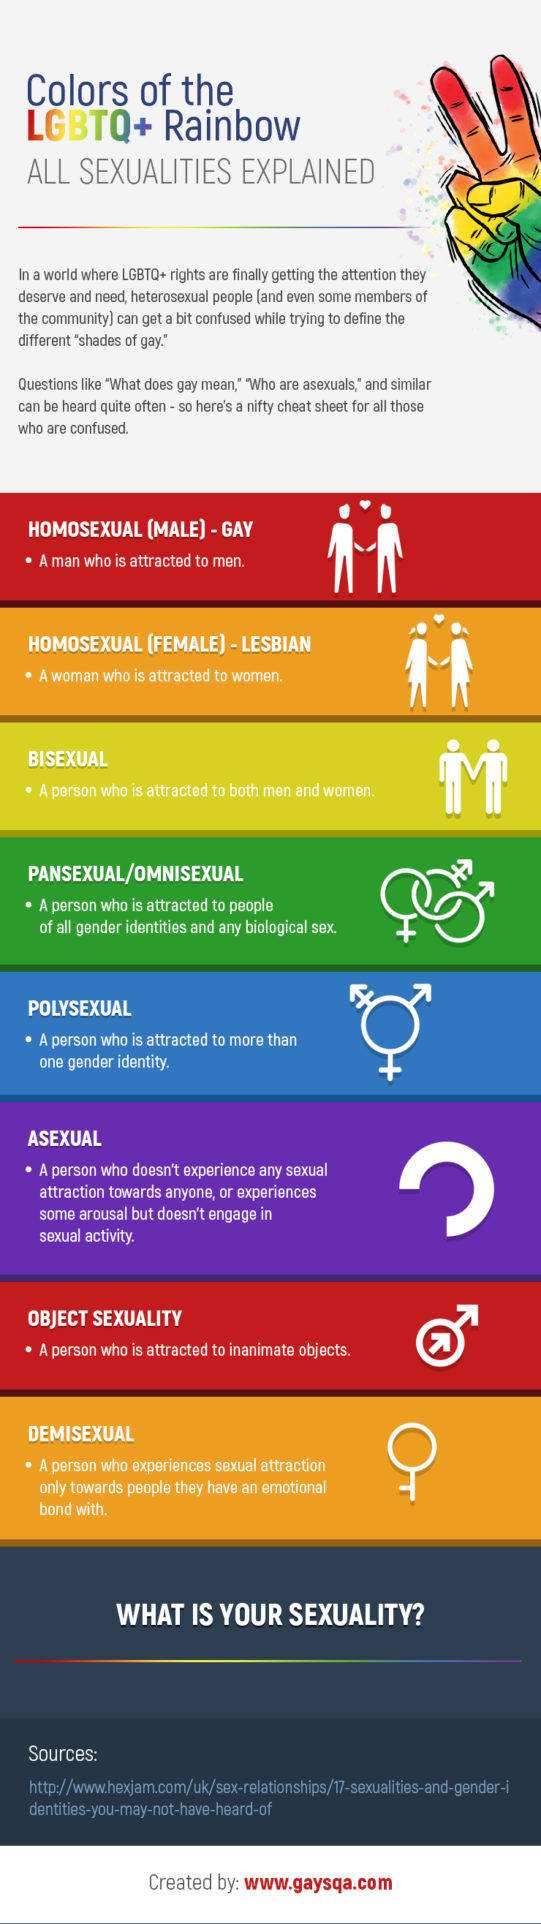 Gay definitions